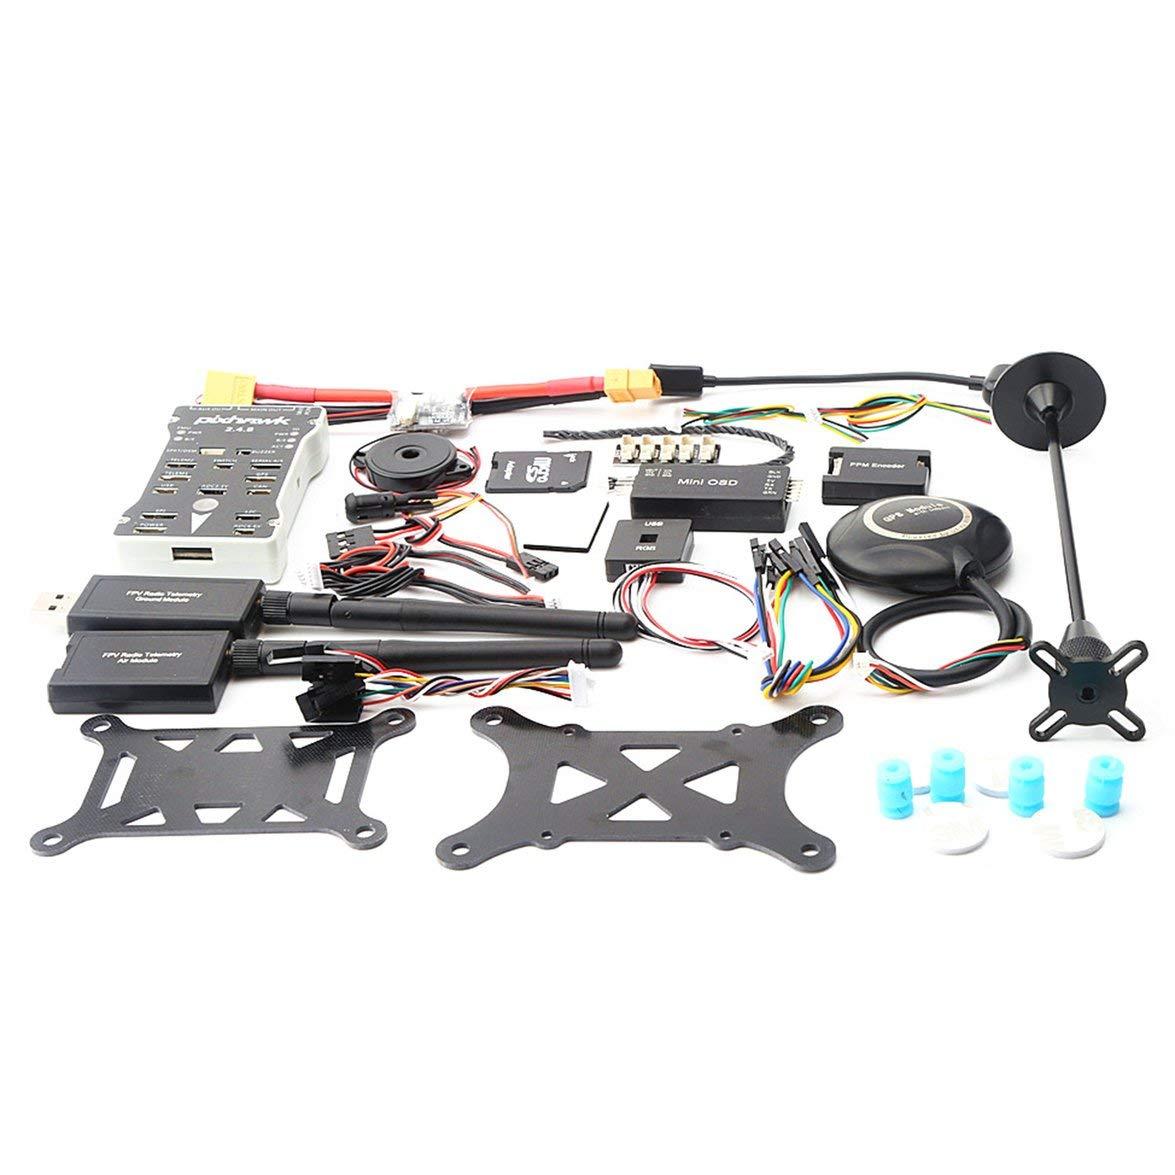 Kongqiabona Pixhawk PX4 PIX 2.4.8 500MW Flight Controller mit Telemetrie + M8N GPS + Mini OSD + PM + Sicherheitsschalter + Summer + PPM + I2C für RC-Drohne